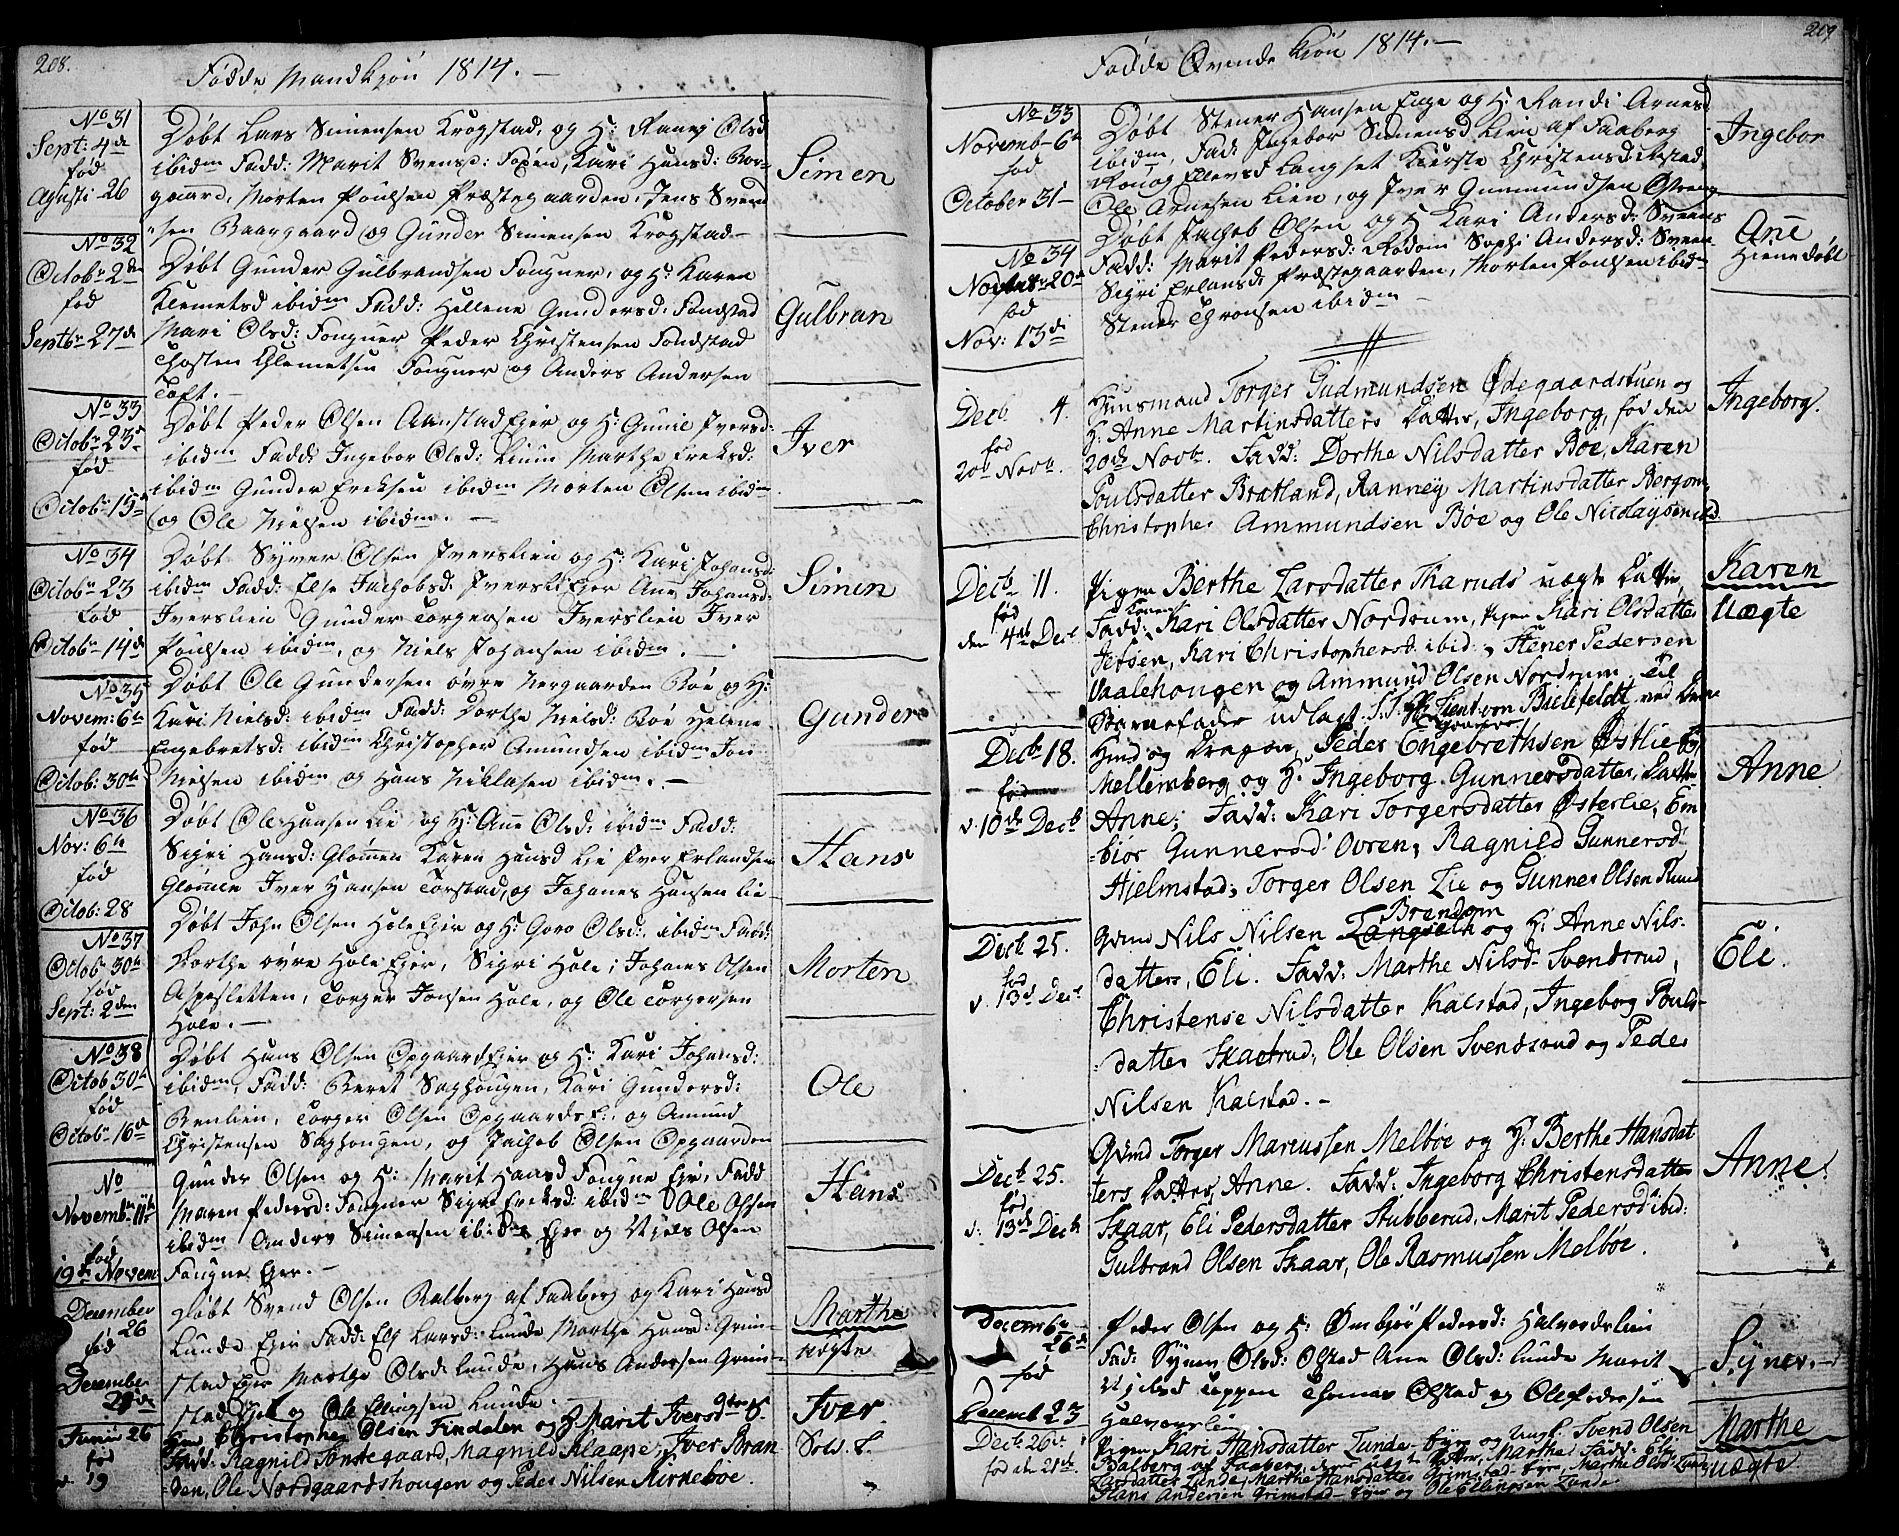 SAH, Gausdal prestekontor, Ministerialbok nr. 4, 1809-1817, s. 208-209